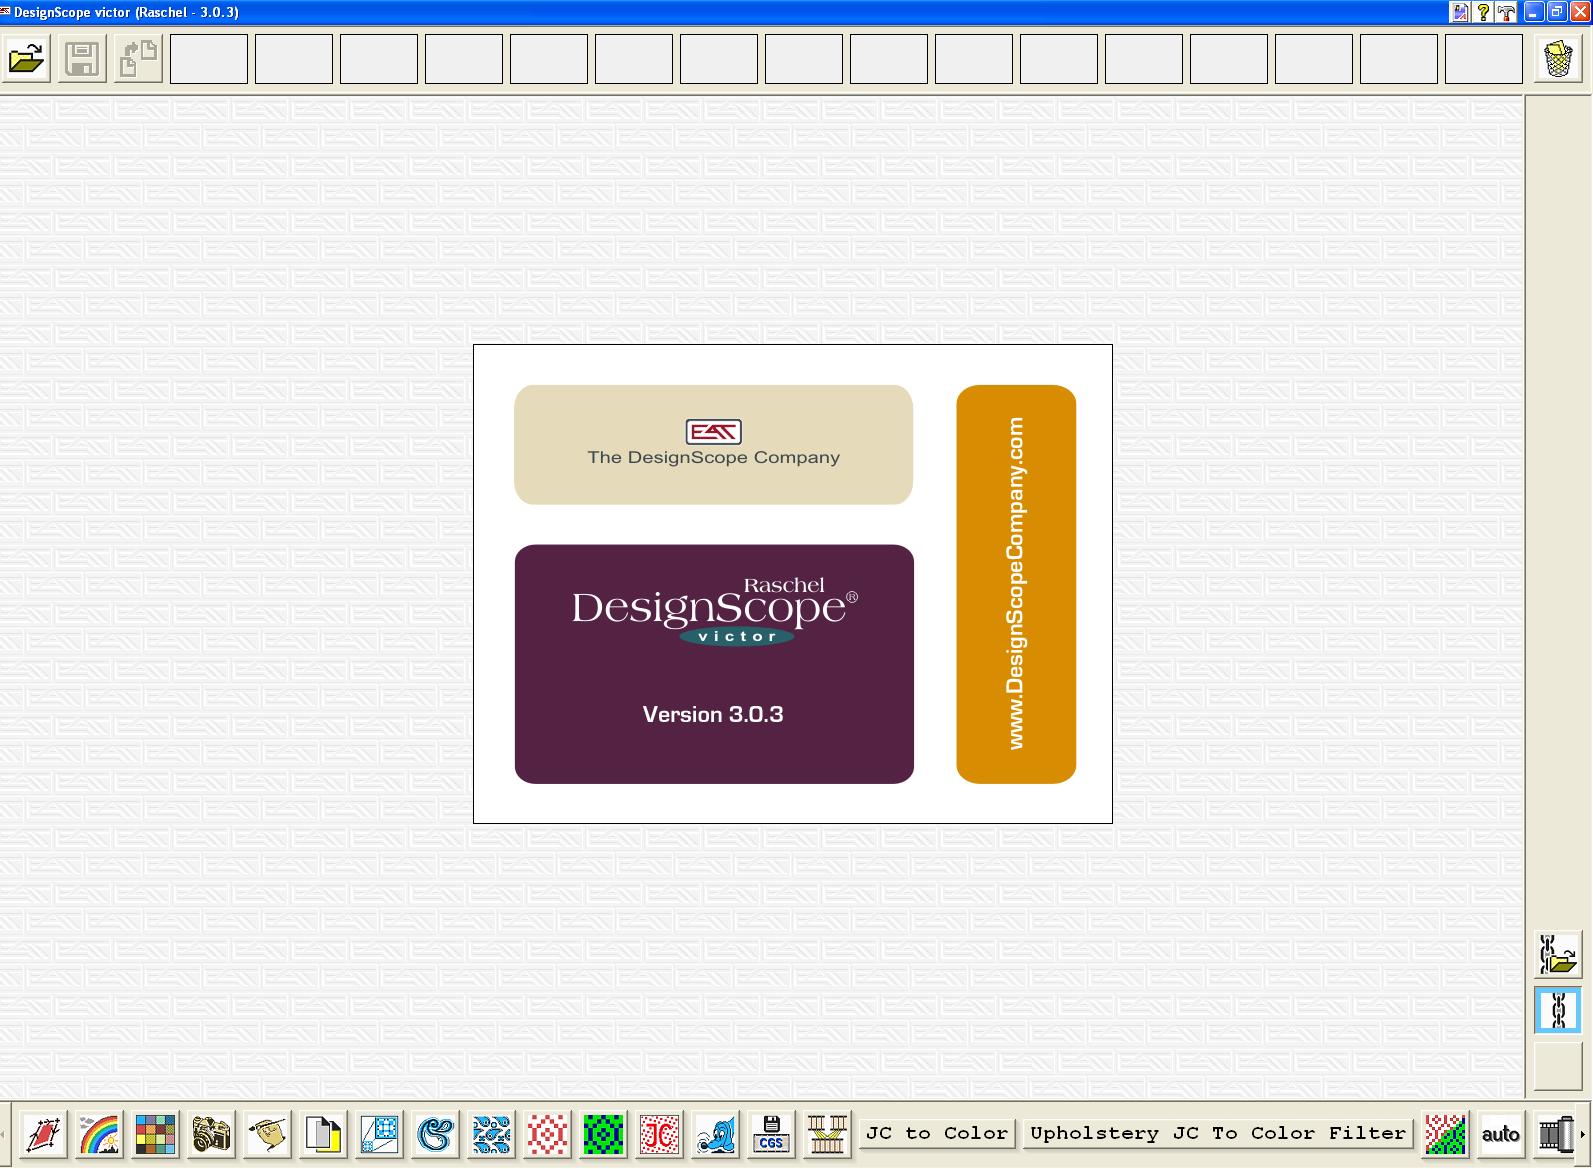 Eat Designscope Victor Software Crack Downloads